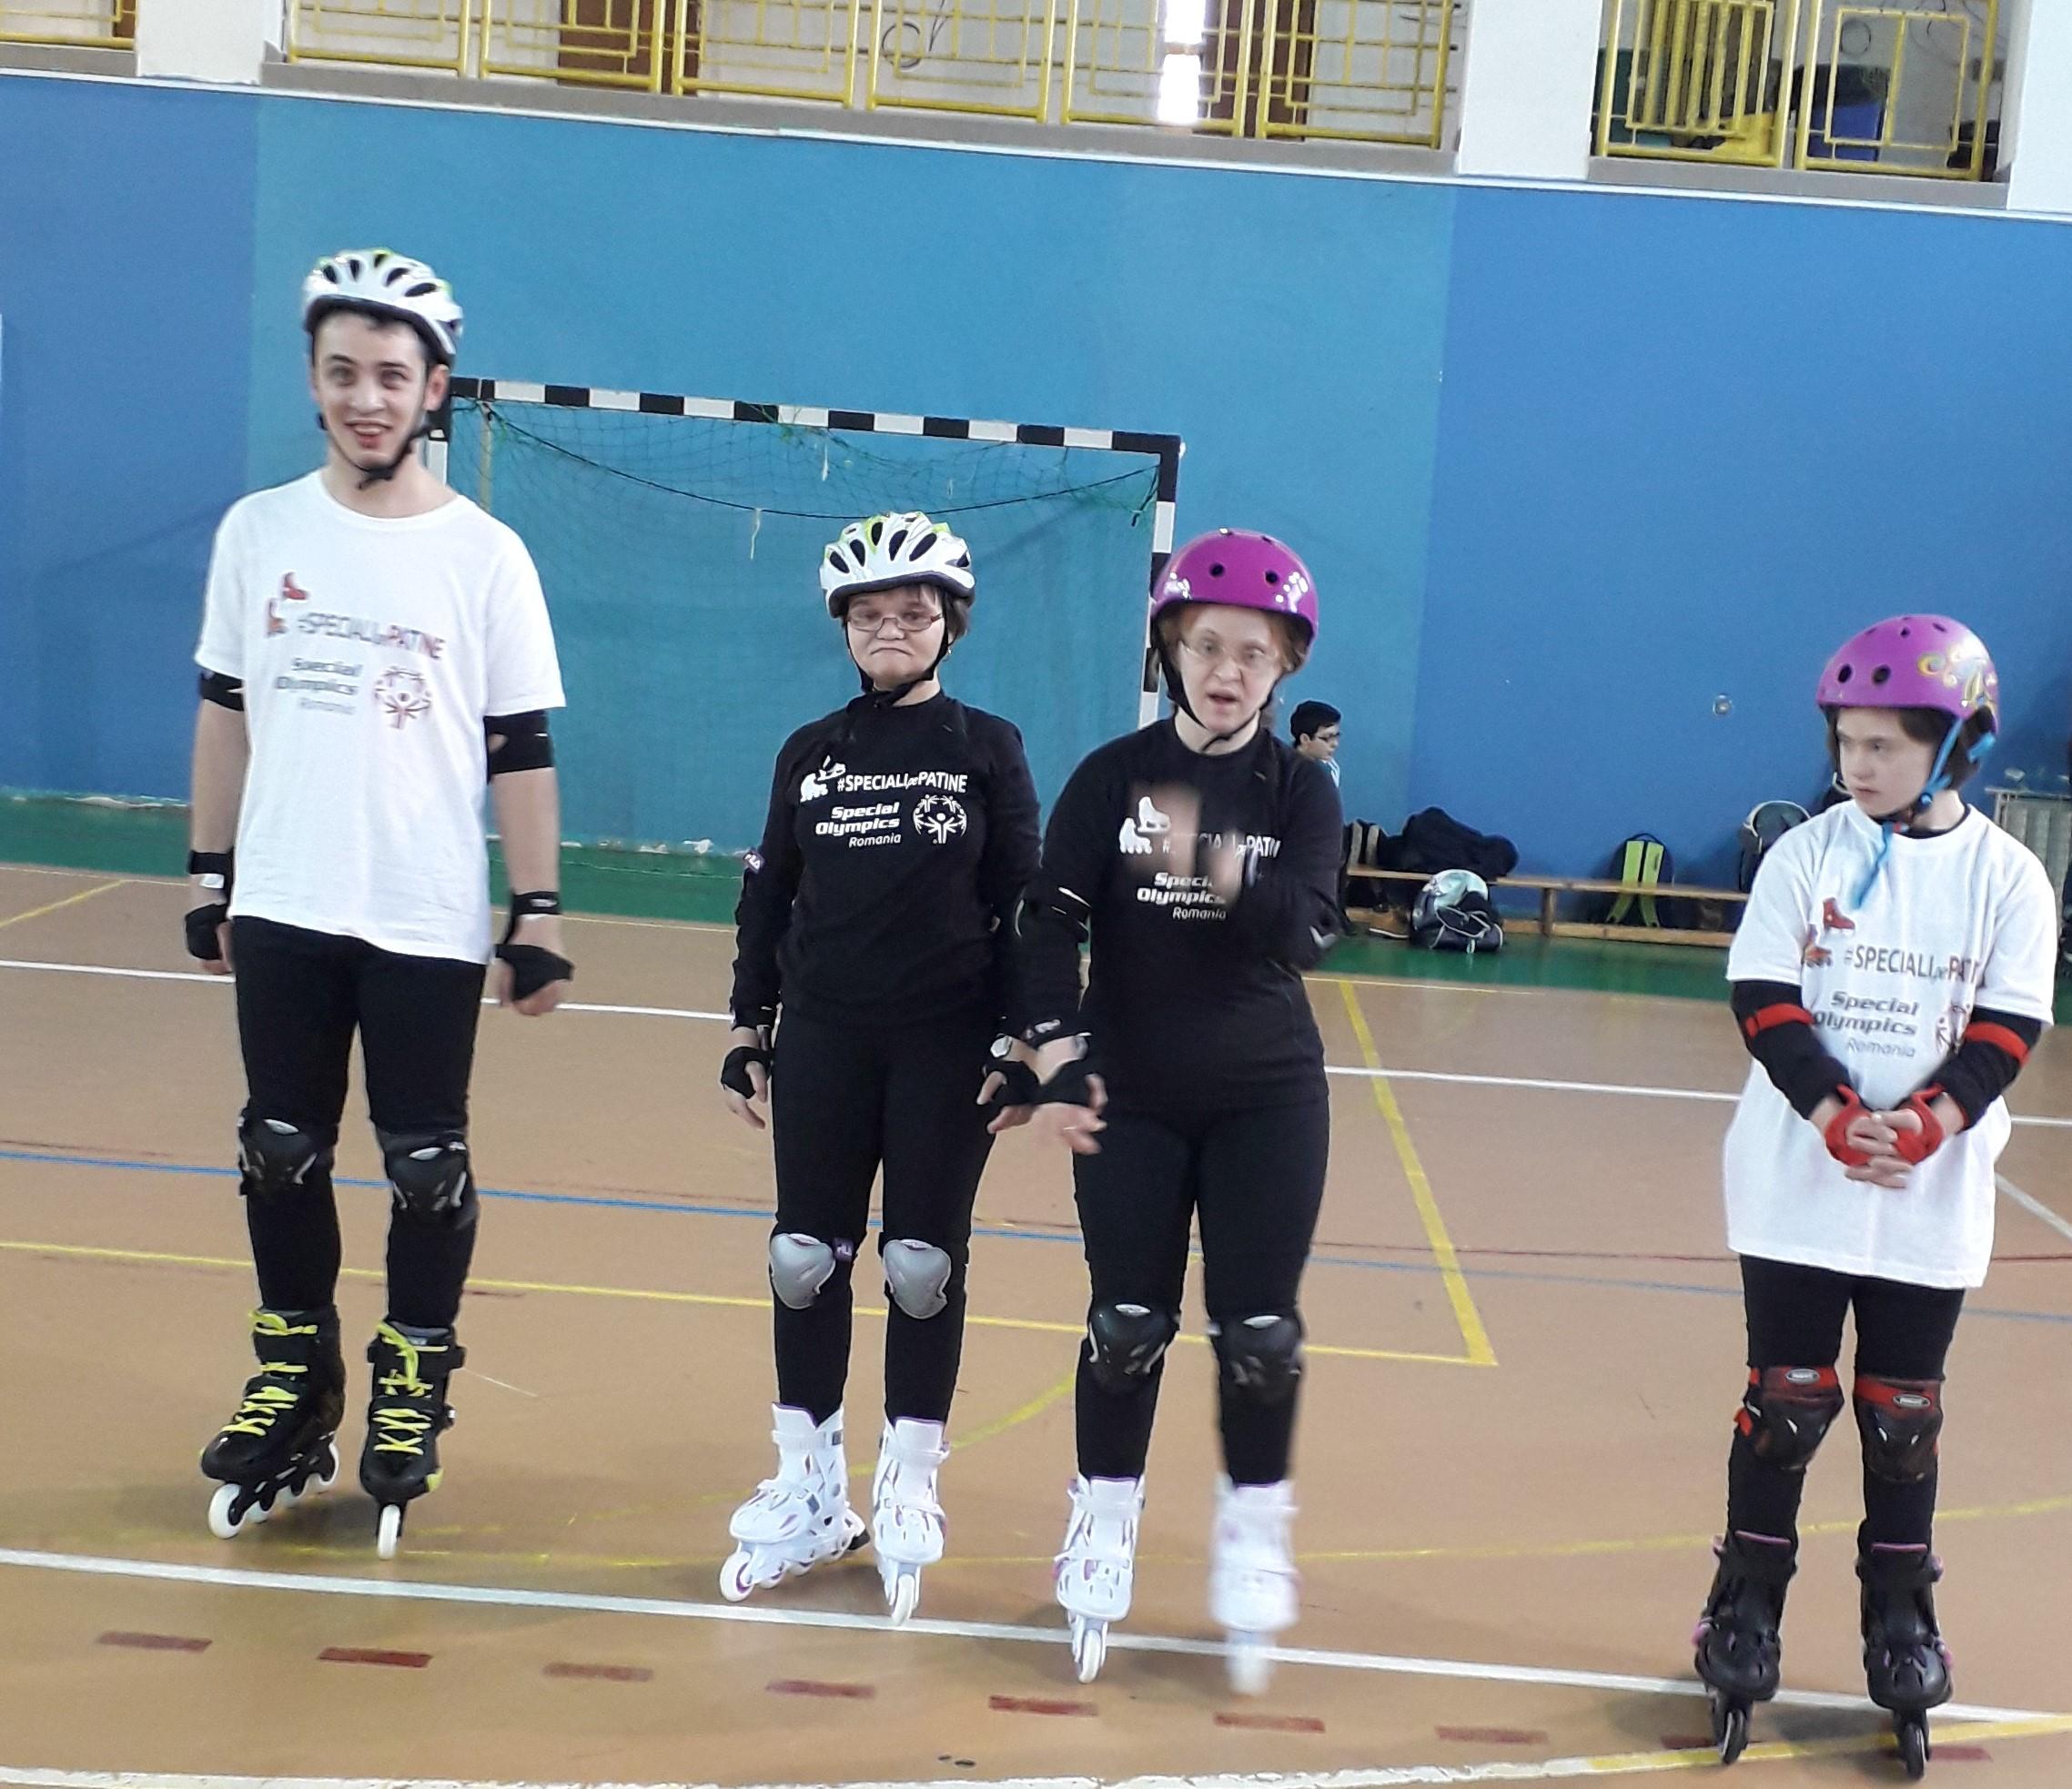 Special Olympics Romania, Speciali pe Patine, Cluj-Napoca (1)